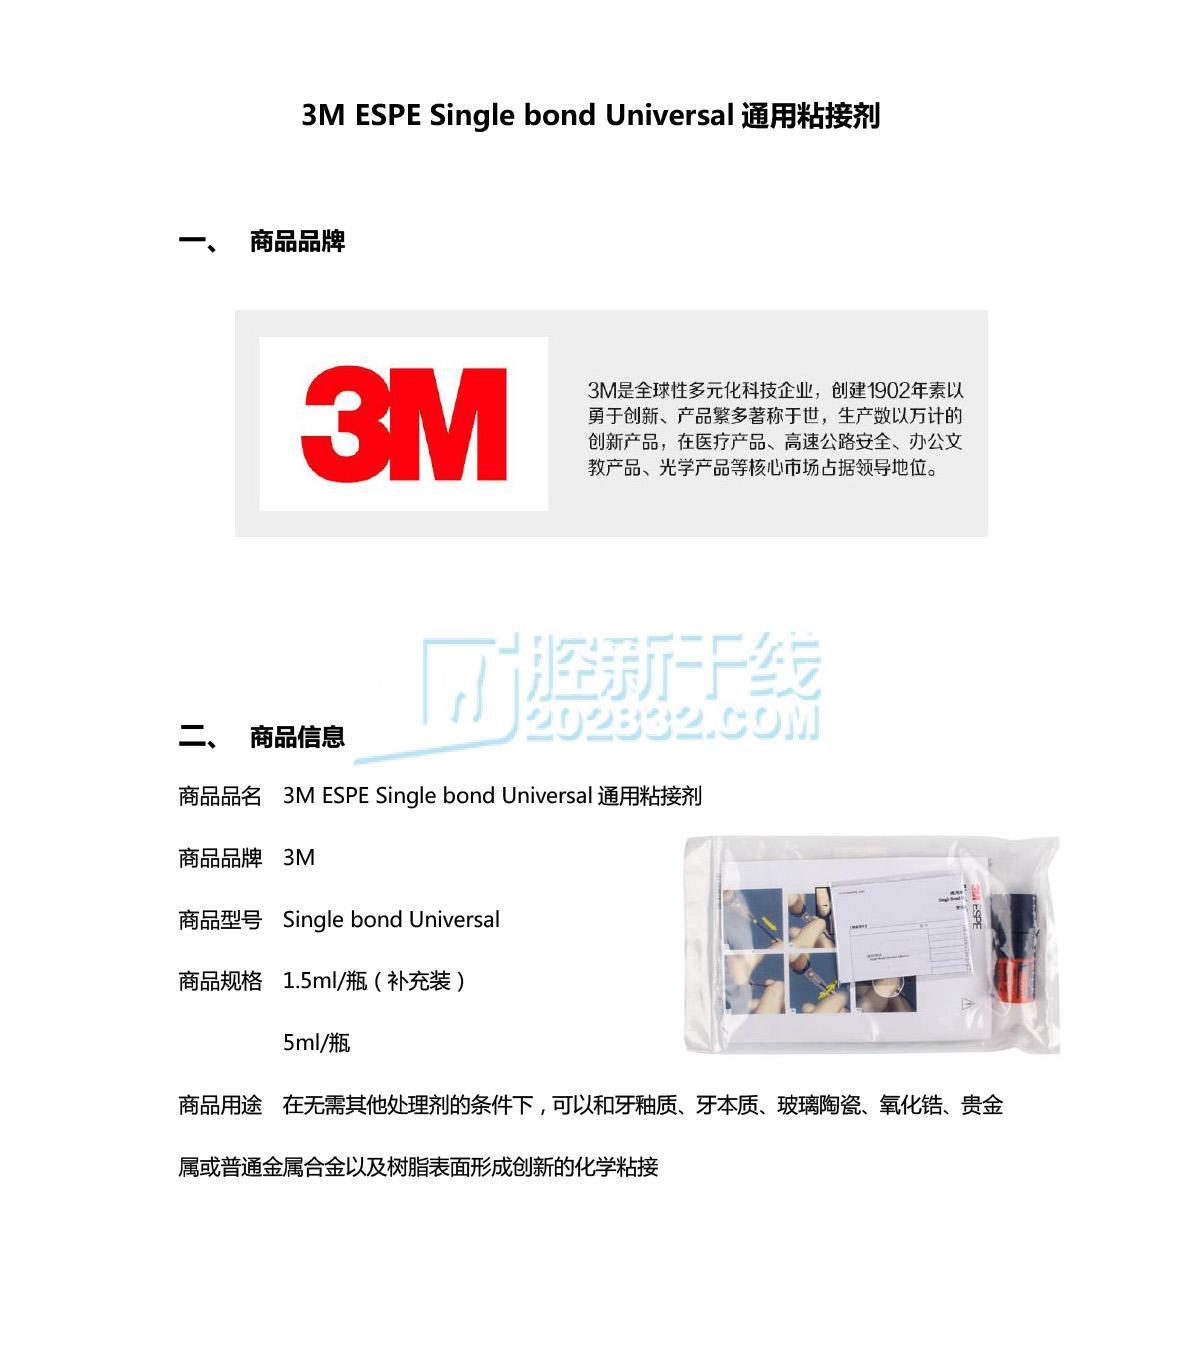 3M ESPE 3M通用粘接系统补充装(通用粘接剂通用粘接剂激活剂) 1.jpg